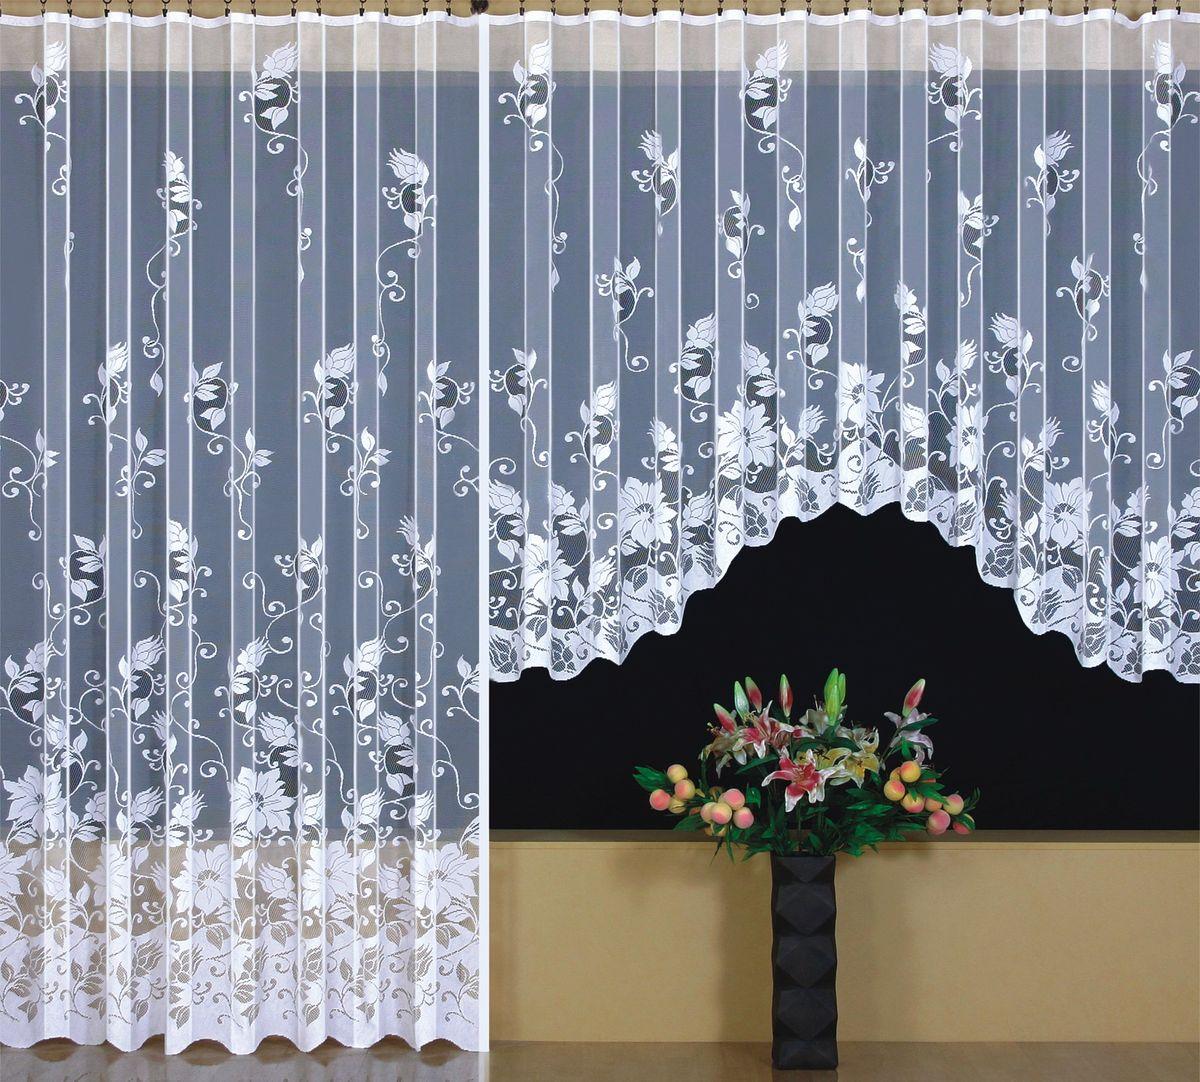 Комплект гардин для балк.двери WISAN 300*160+200*250. 9415+94139415+9413Комплект гардин для балк.двери WISAN 300*160+200*250. 9415+9413Материал: 100% п/э, размер: 300*160+200*250, цвет: белый